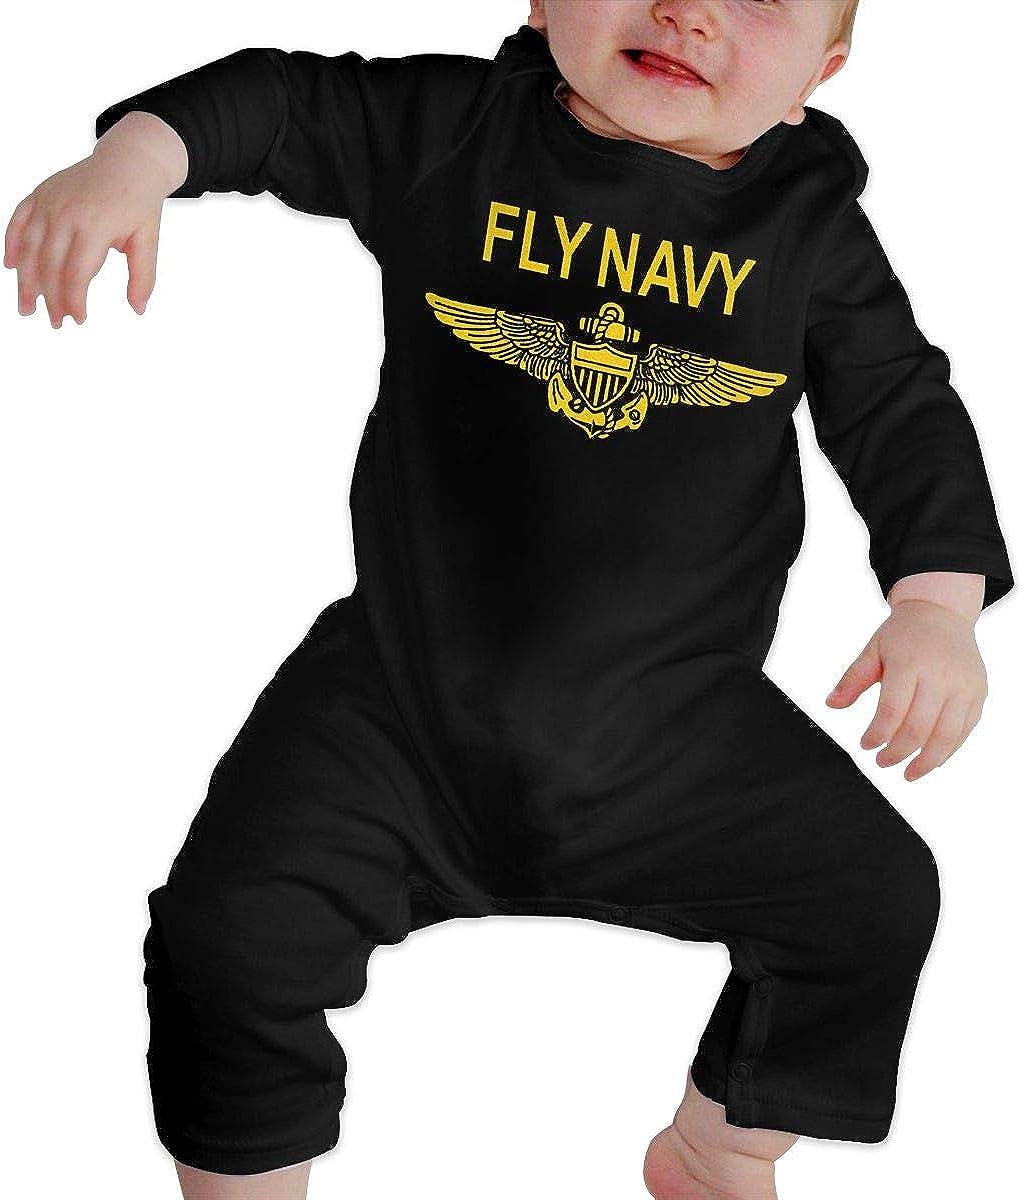 Unisex Baby Fly Navy Pilot Wings Logo Jumpsuit Cotton Romper Long-Sleeve Bodysuit One-Piece Suit